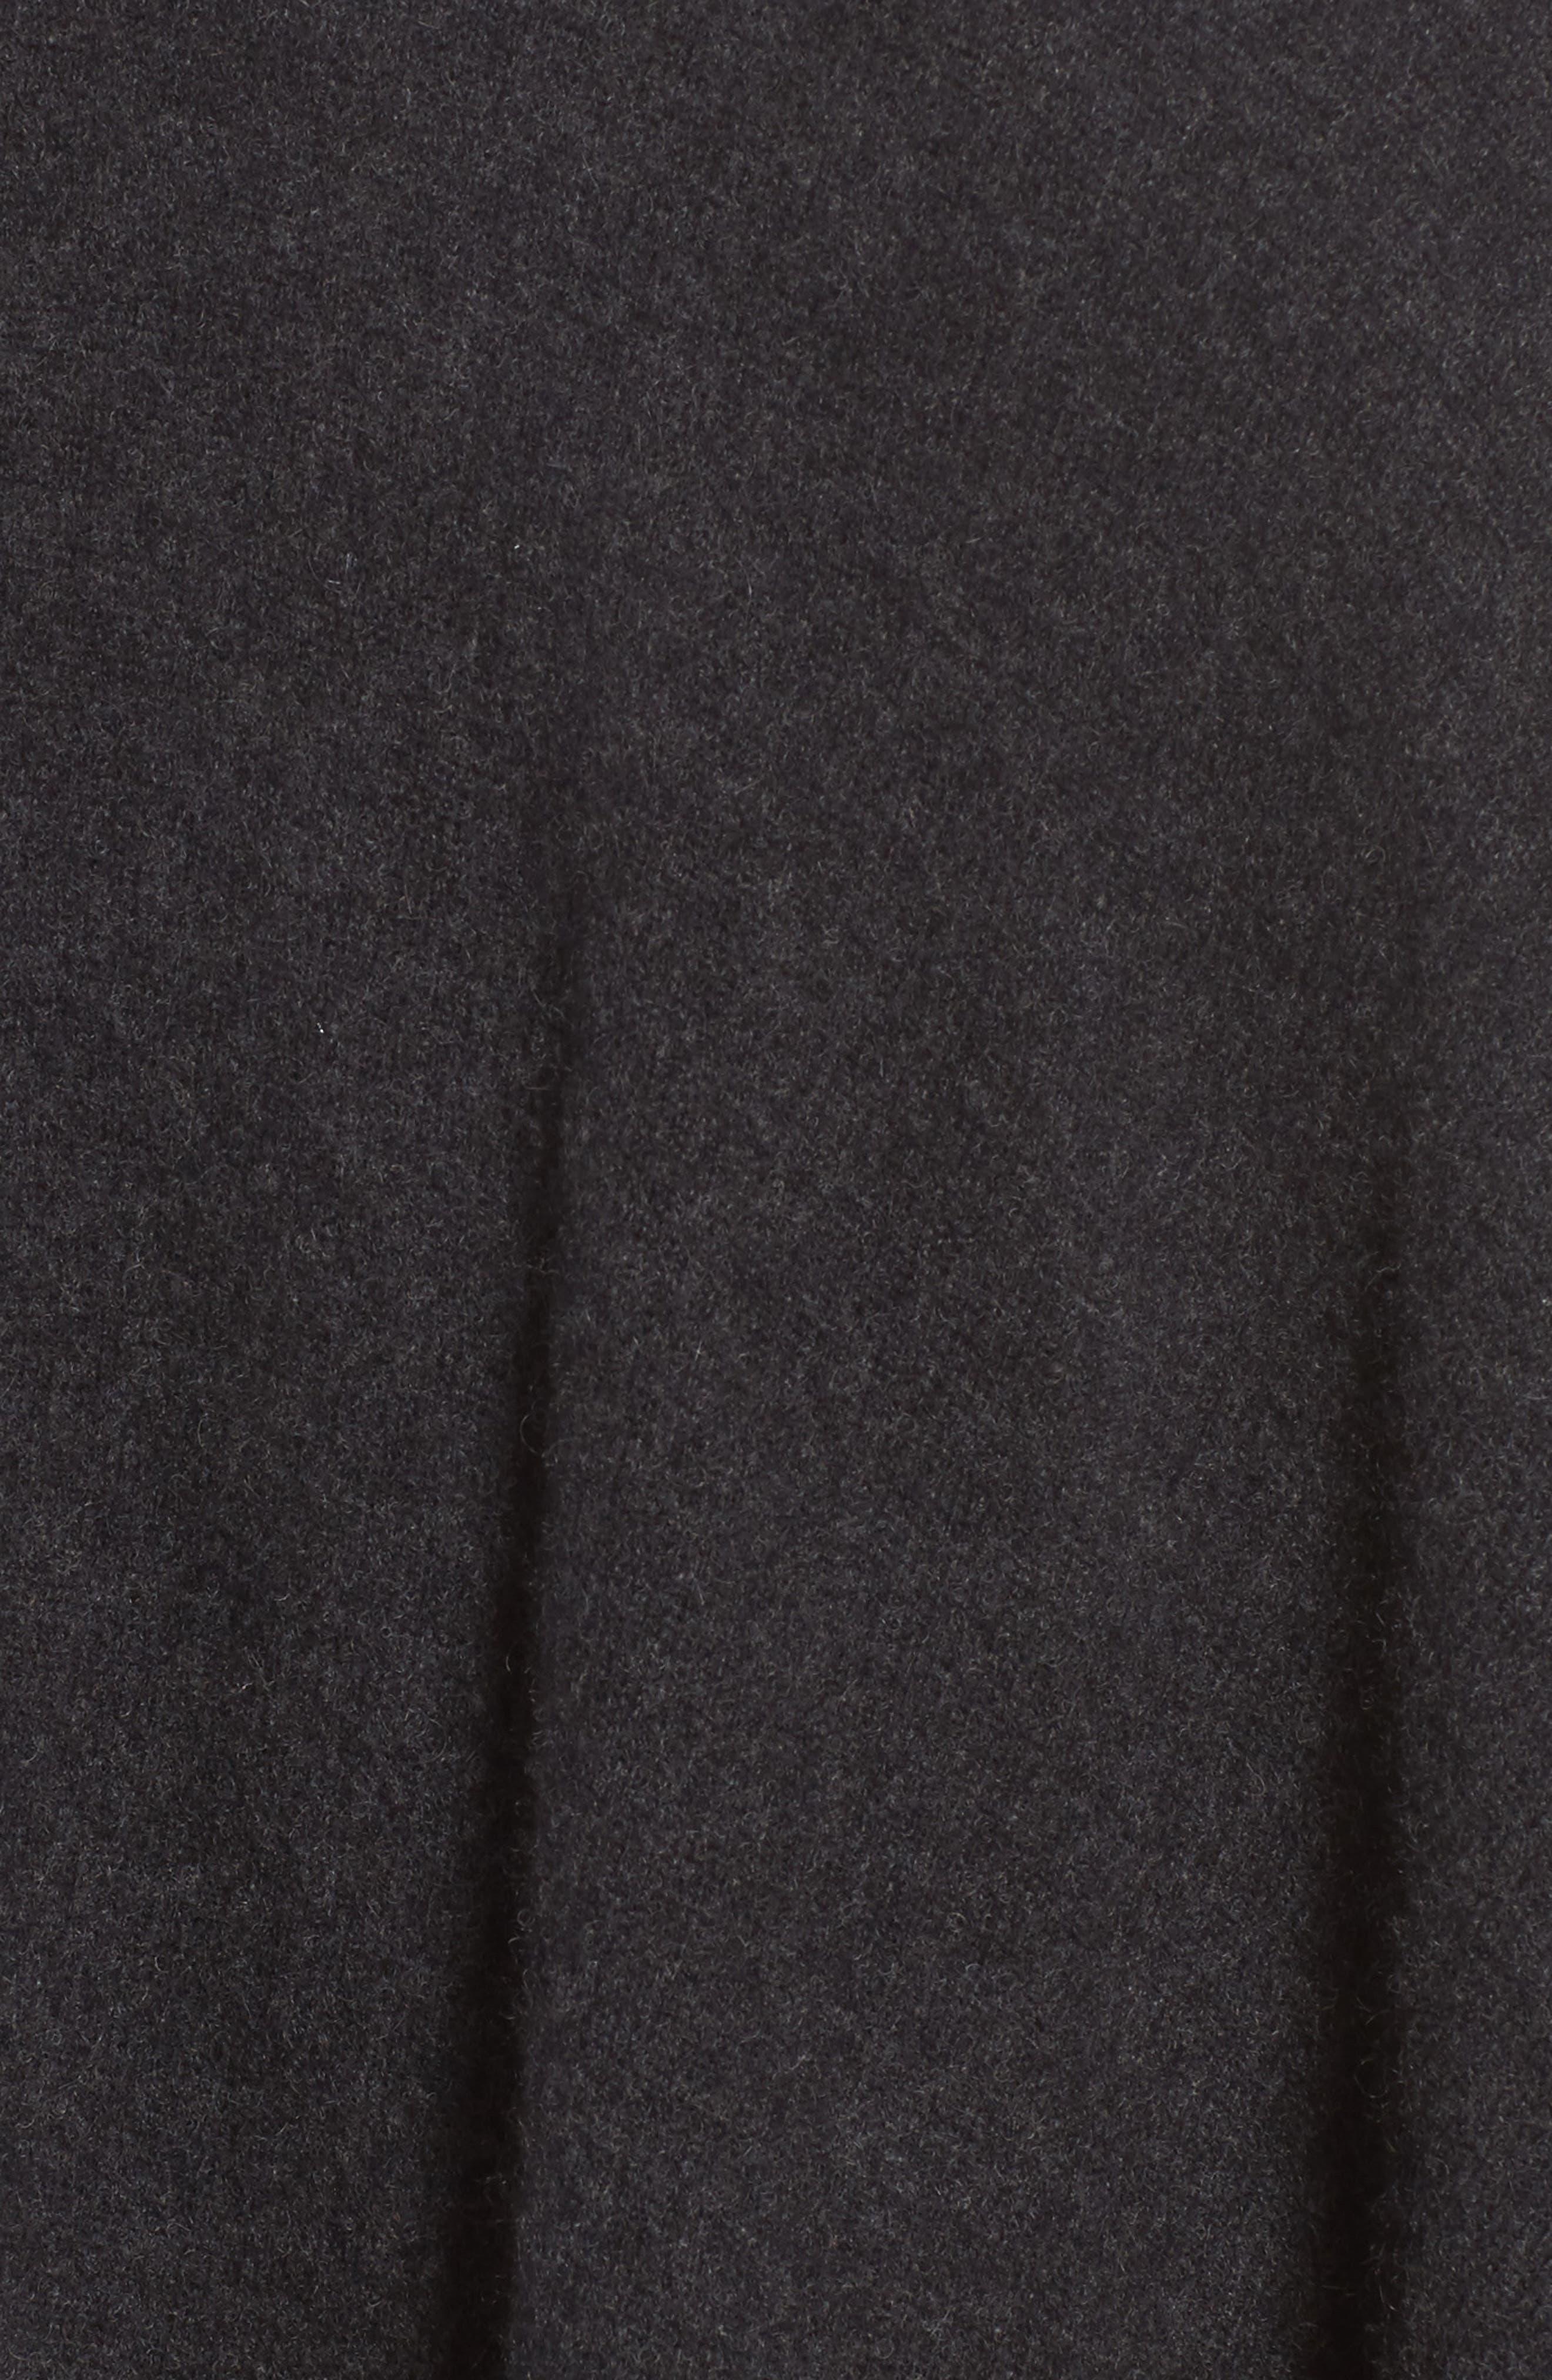 Luxe Stripe Cashmere Ruana,                             Alternate thumbnail 5, color,                             001